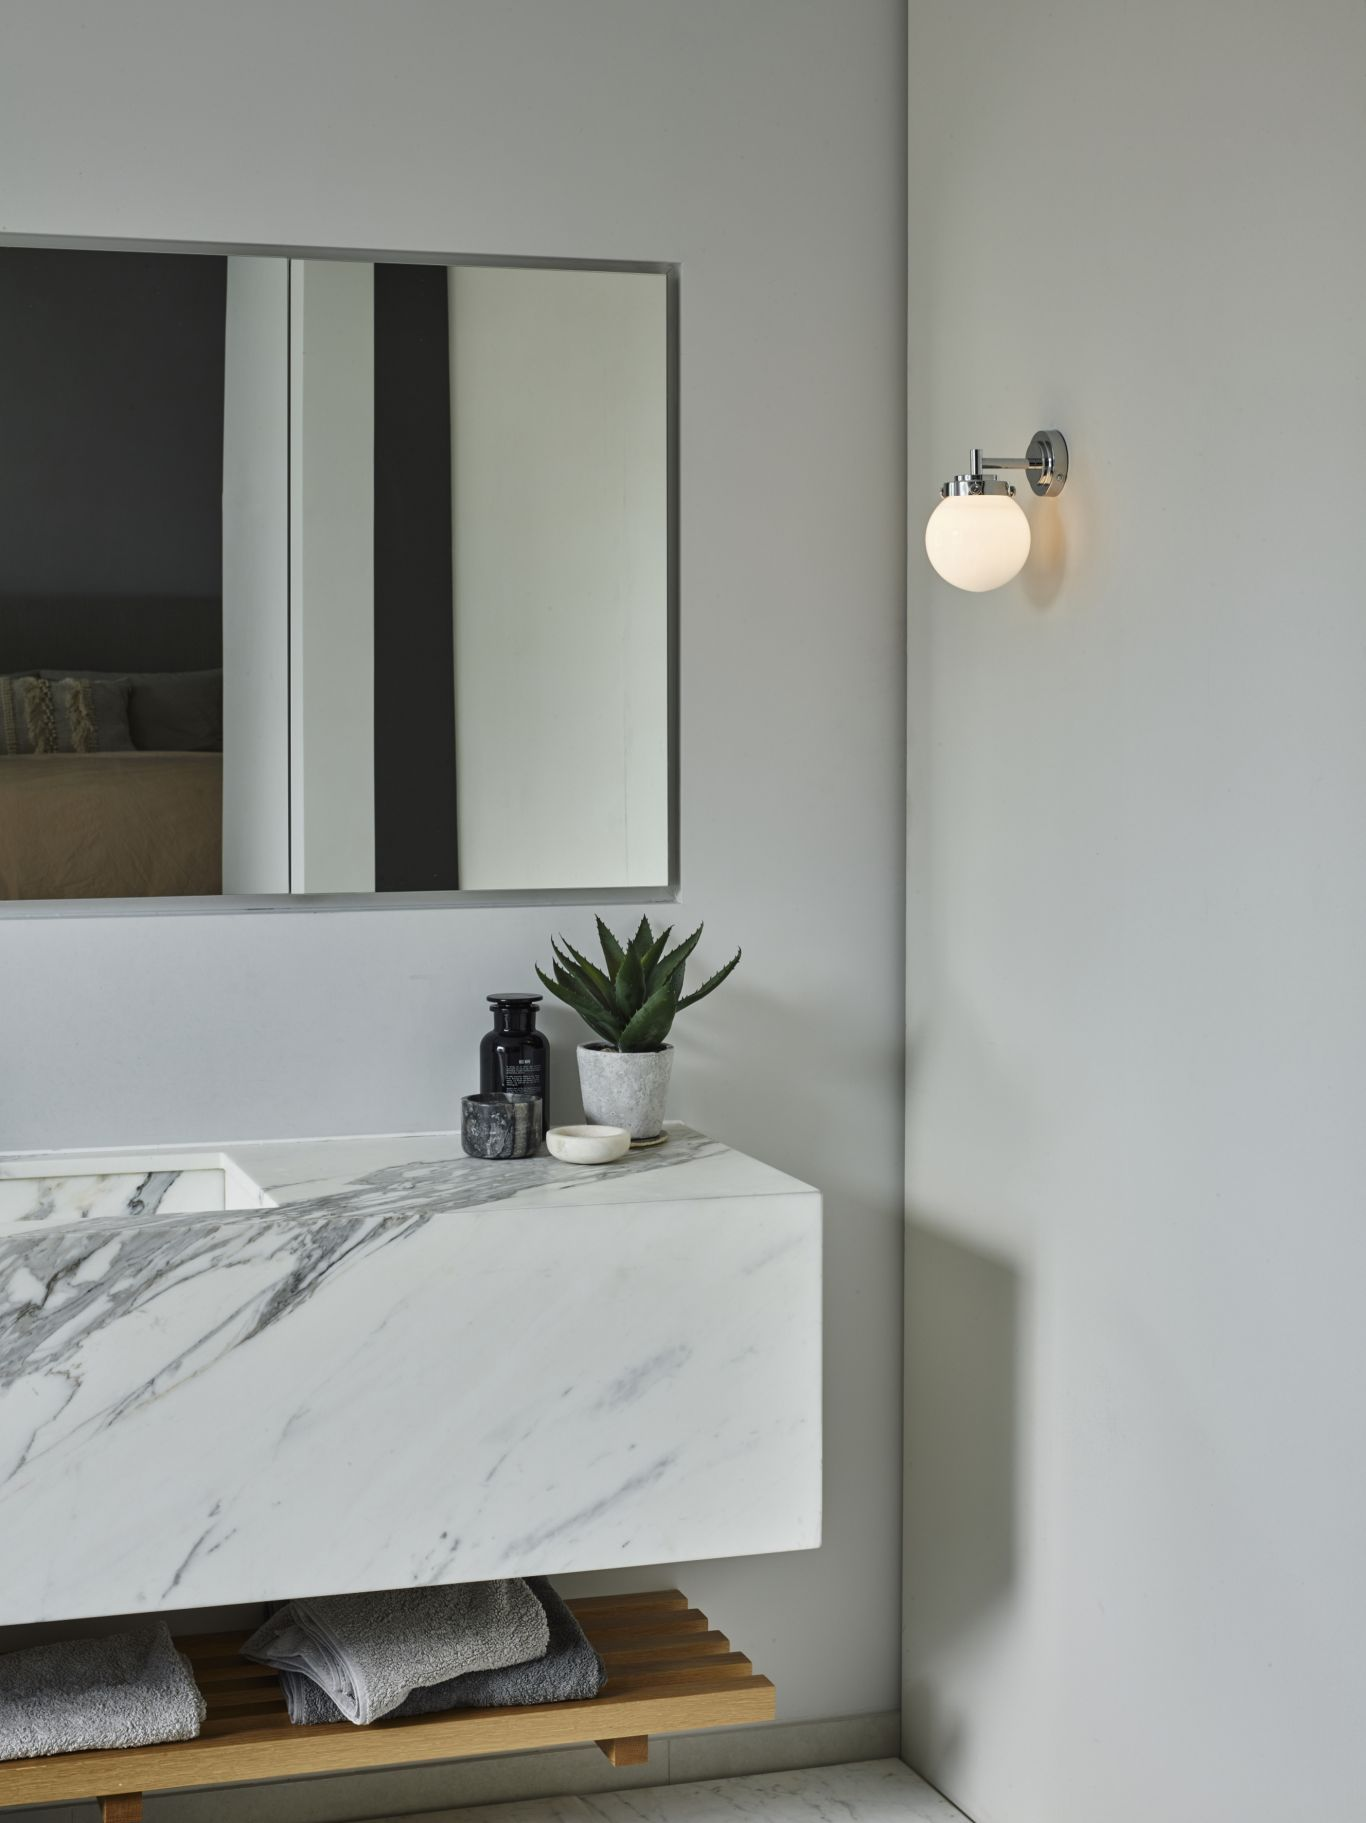 bathroom Mirror and light design ideas